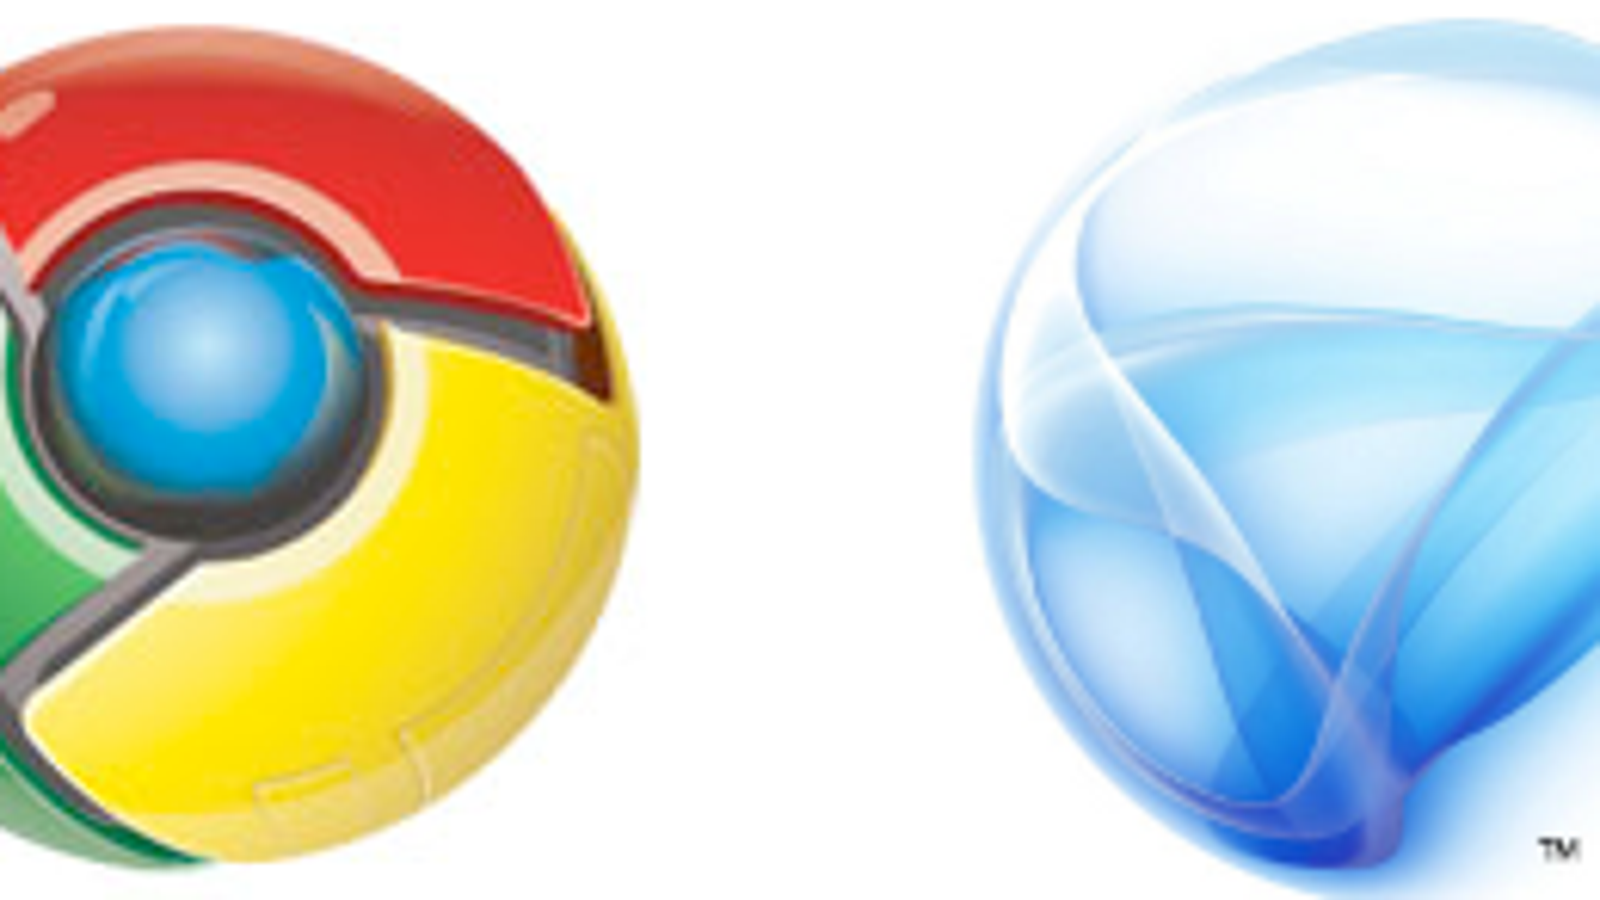 Run Silverlight Plug-In on Google Chrome